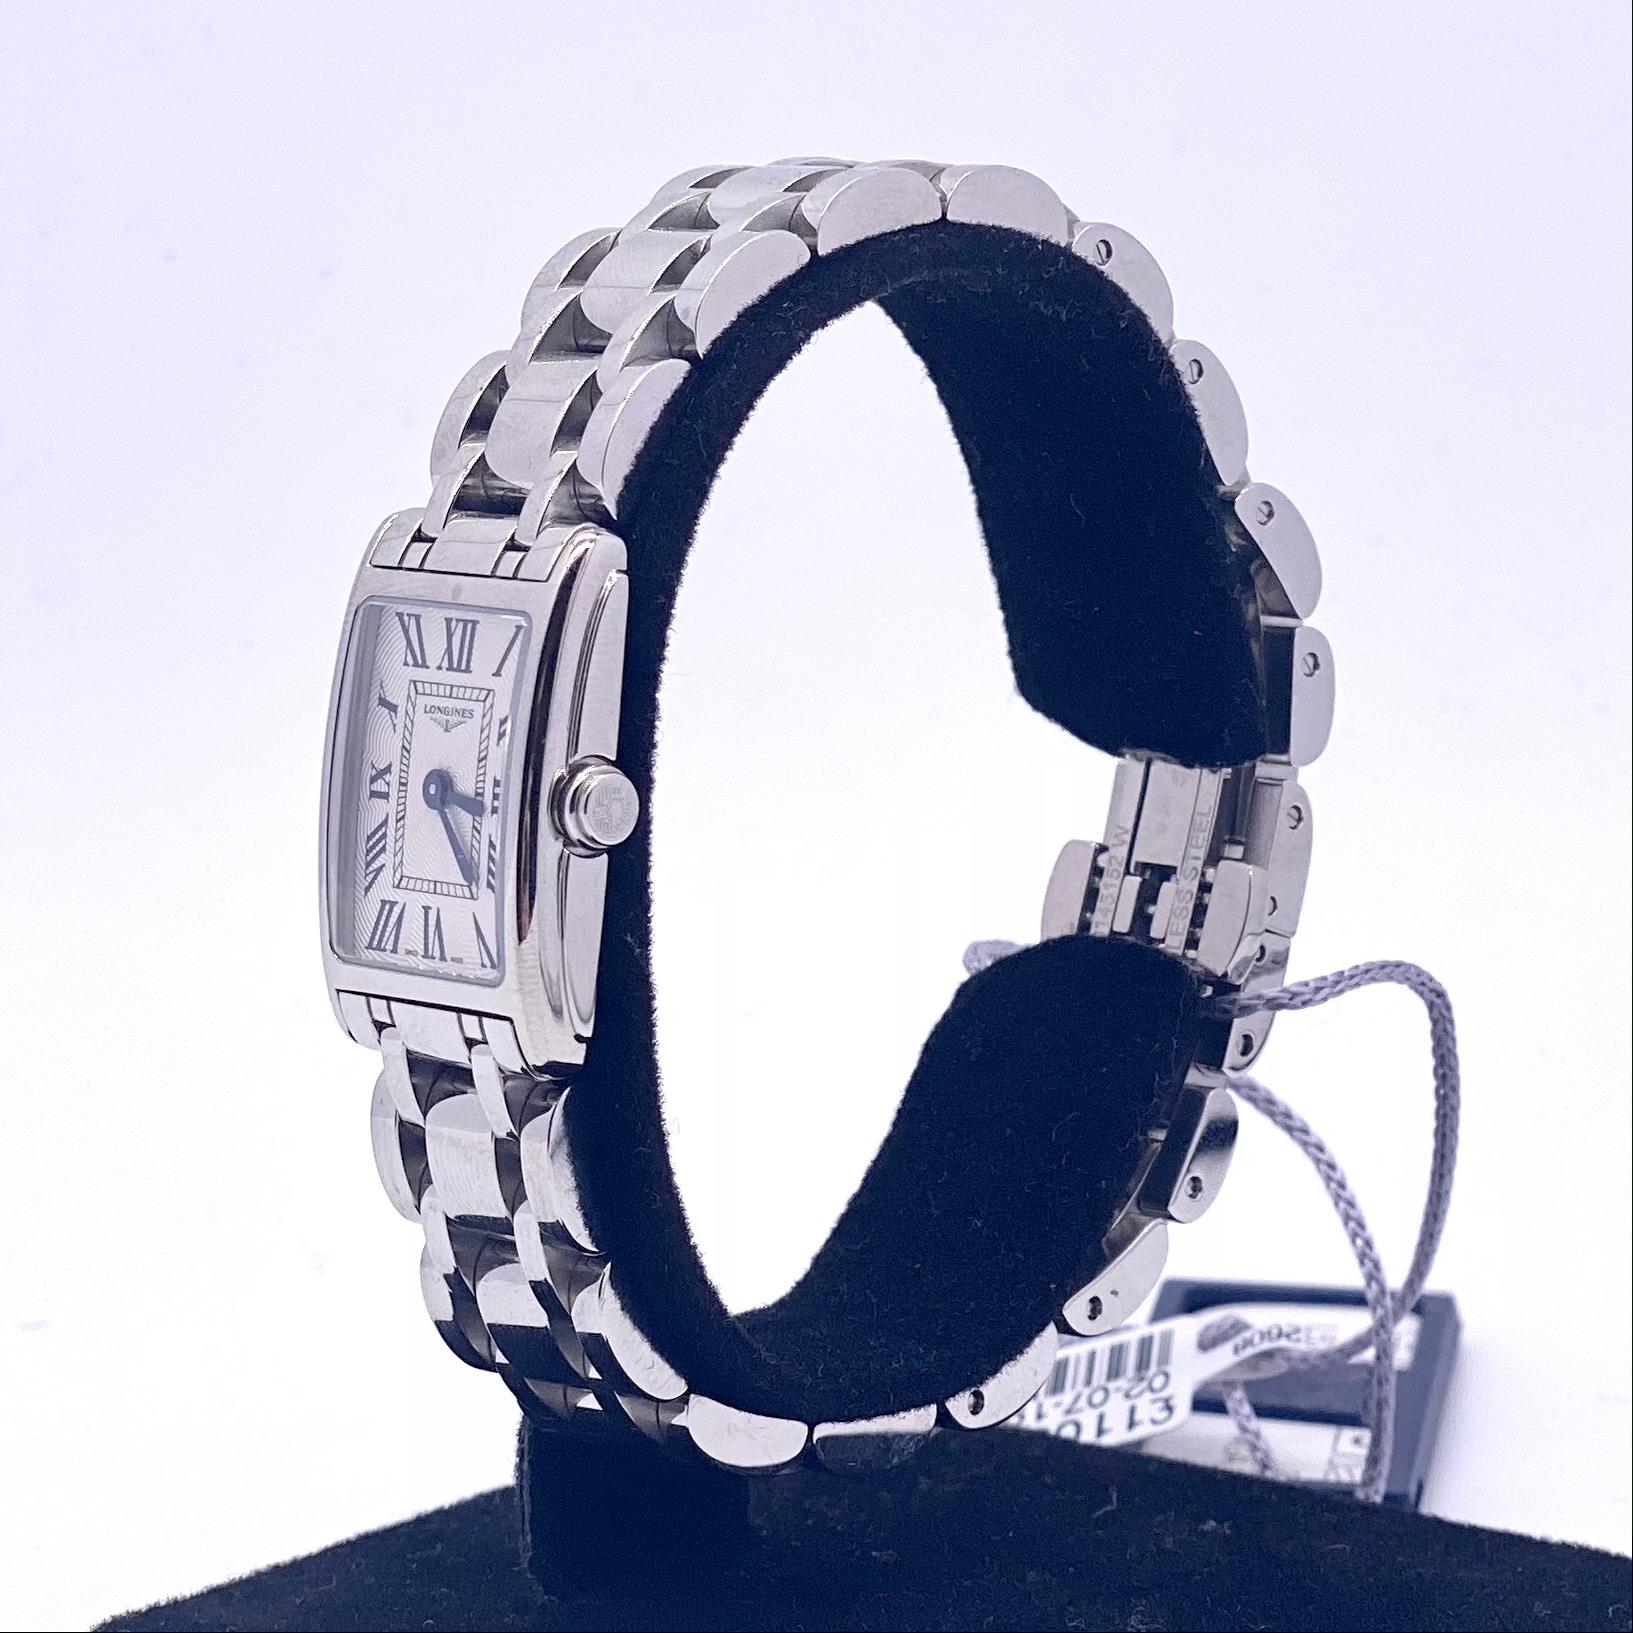 Longines Ladies Dolce Vita Watch ref L52584719 - Image 2 of 3